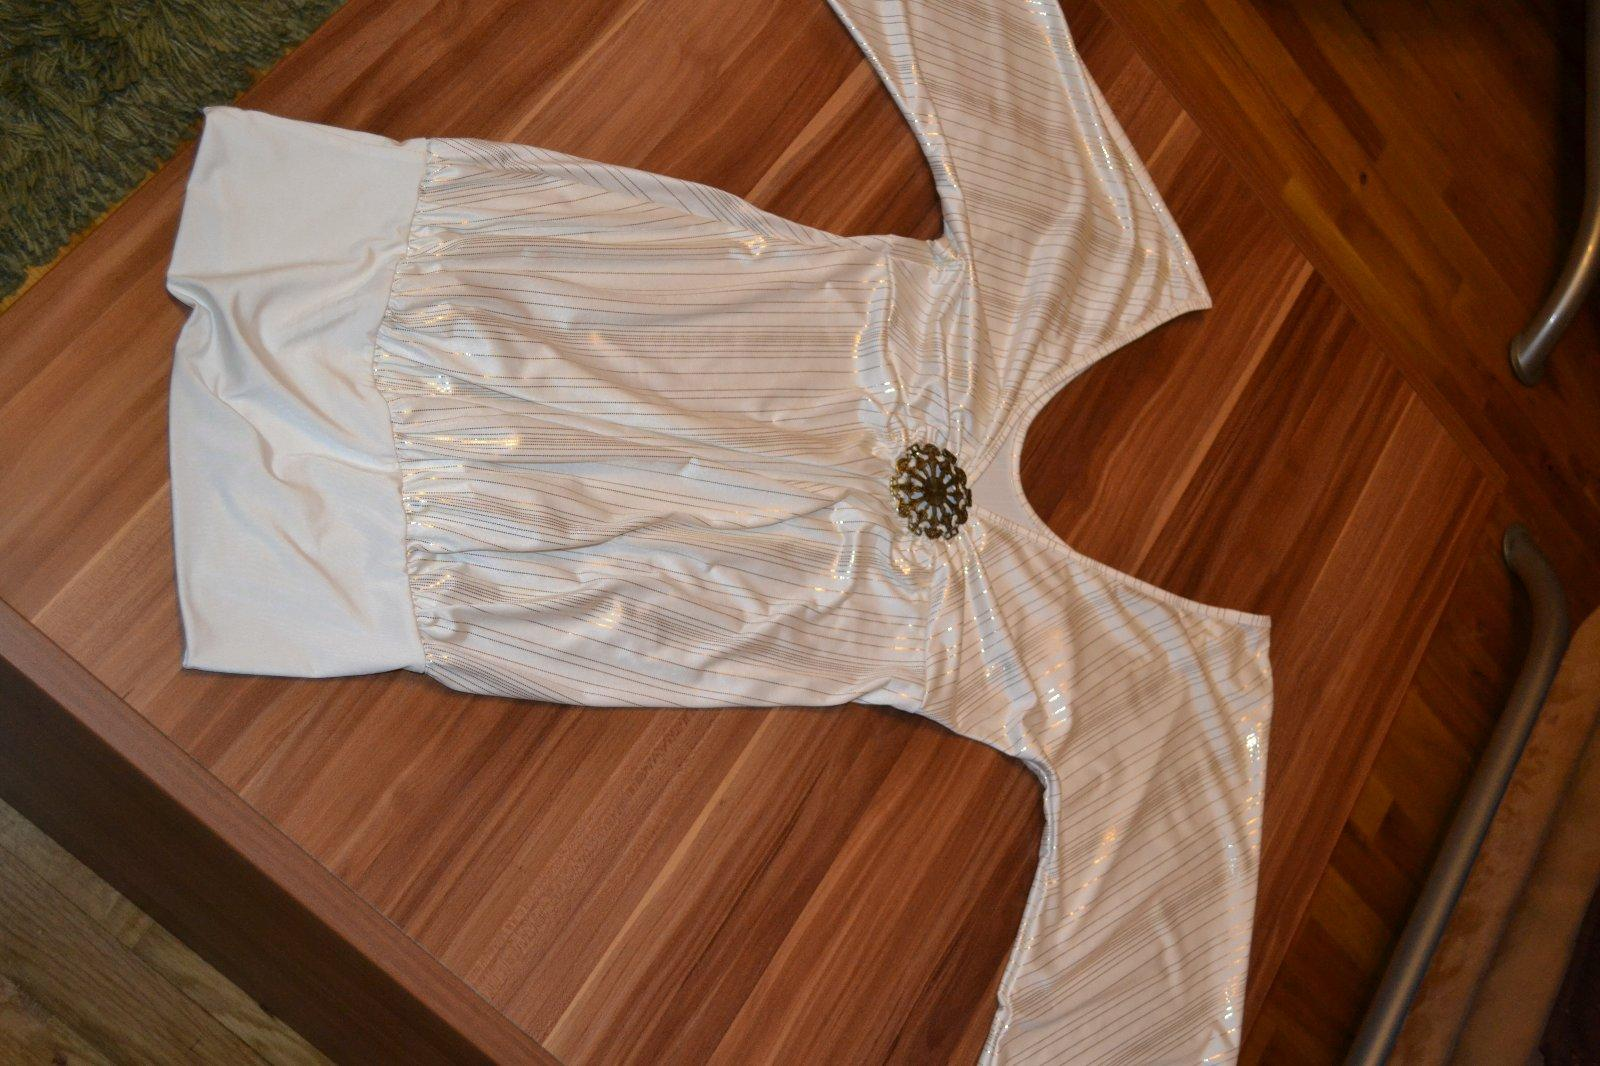 e099b95a17a7 Rensix zlato biele šaty alebo tunika